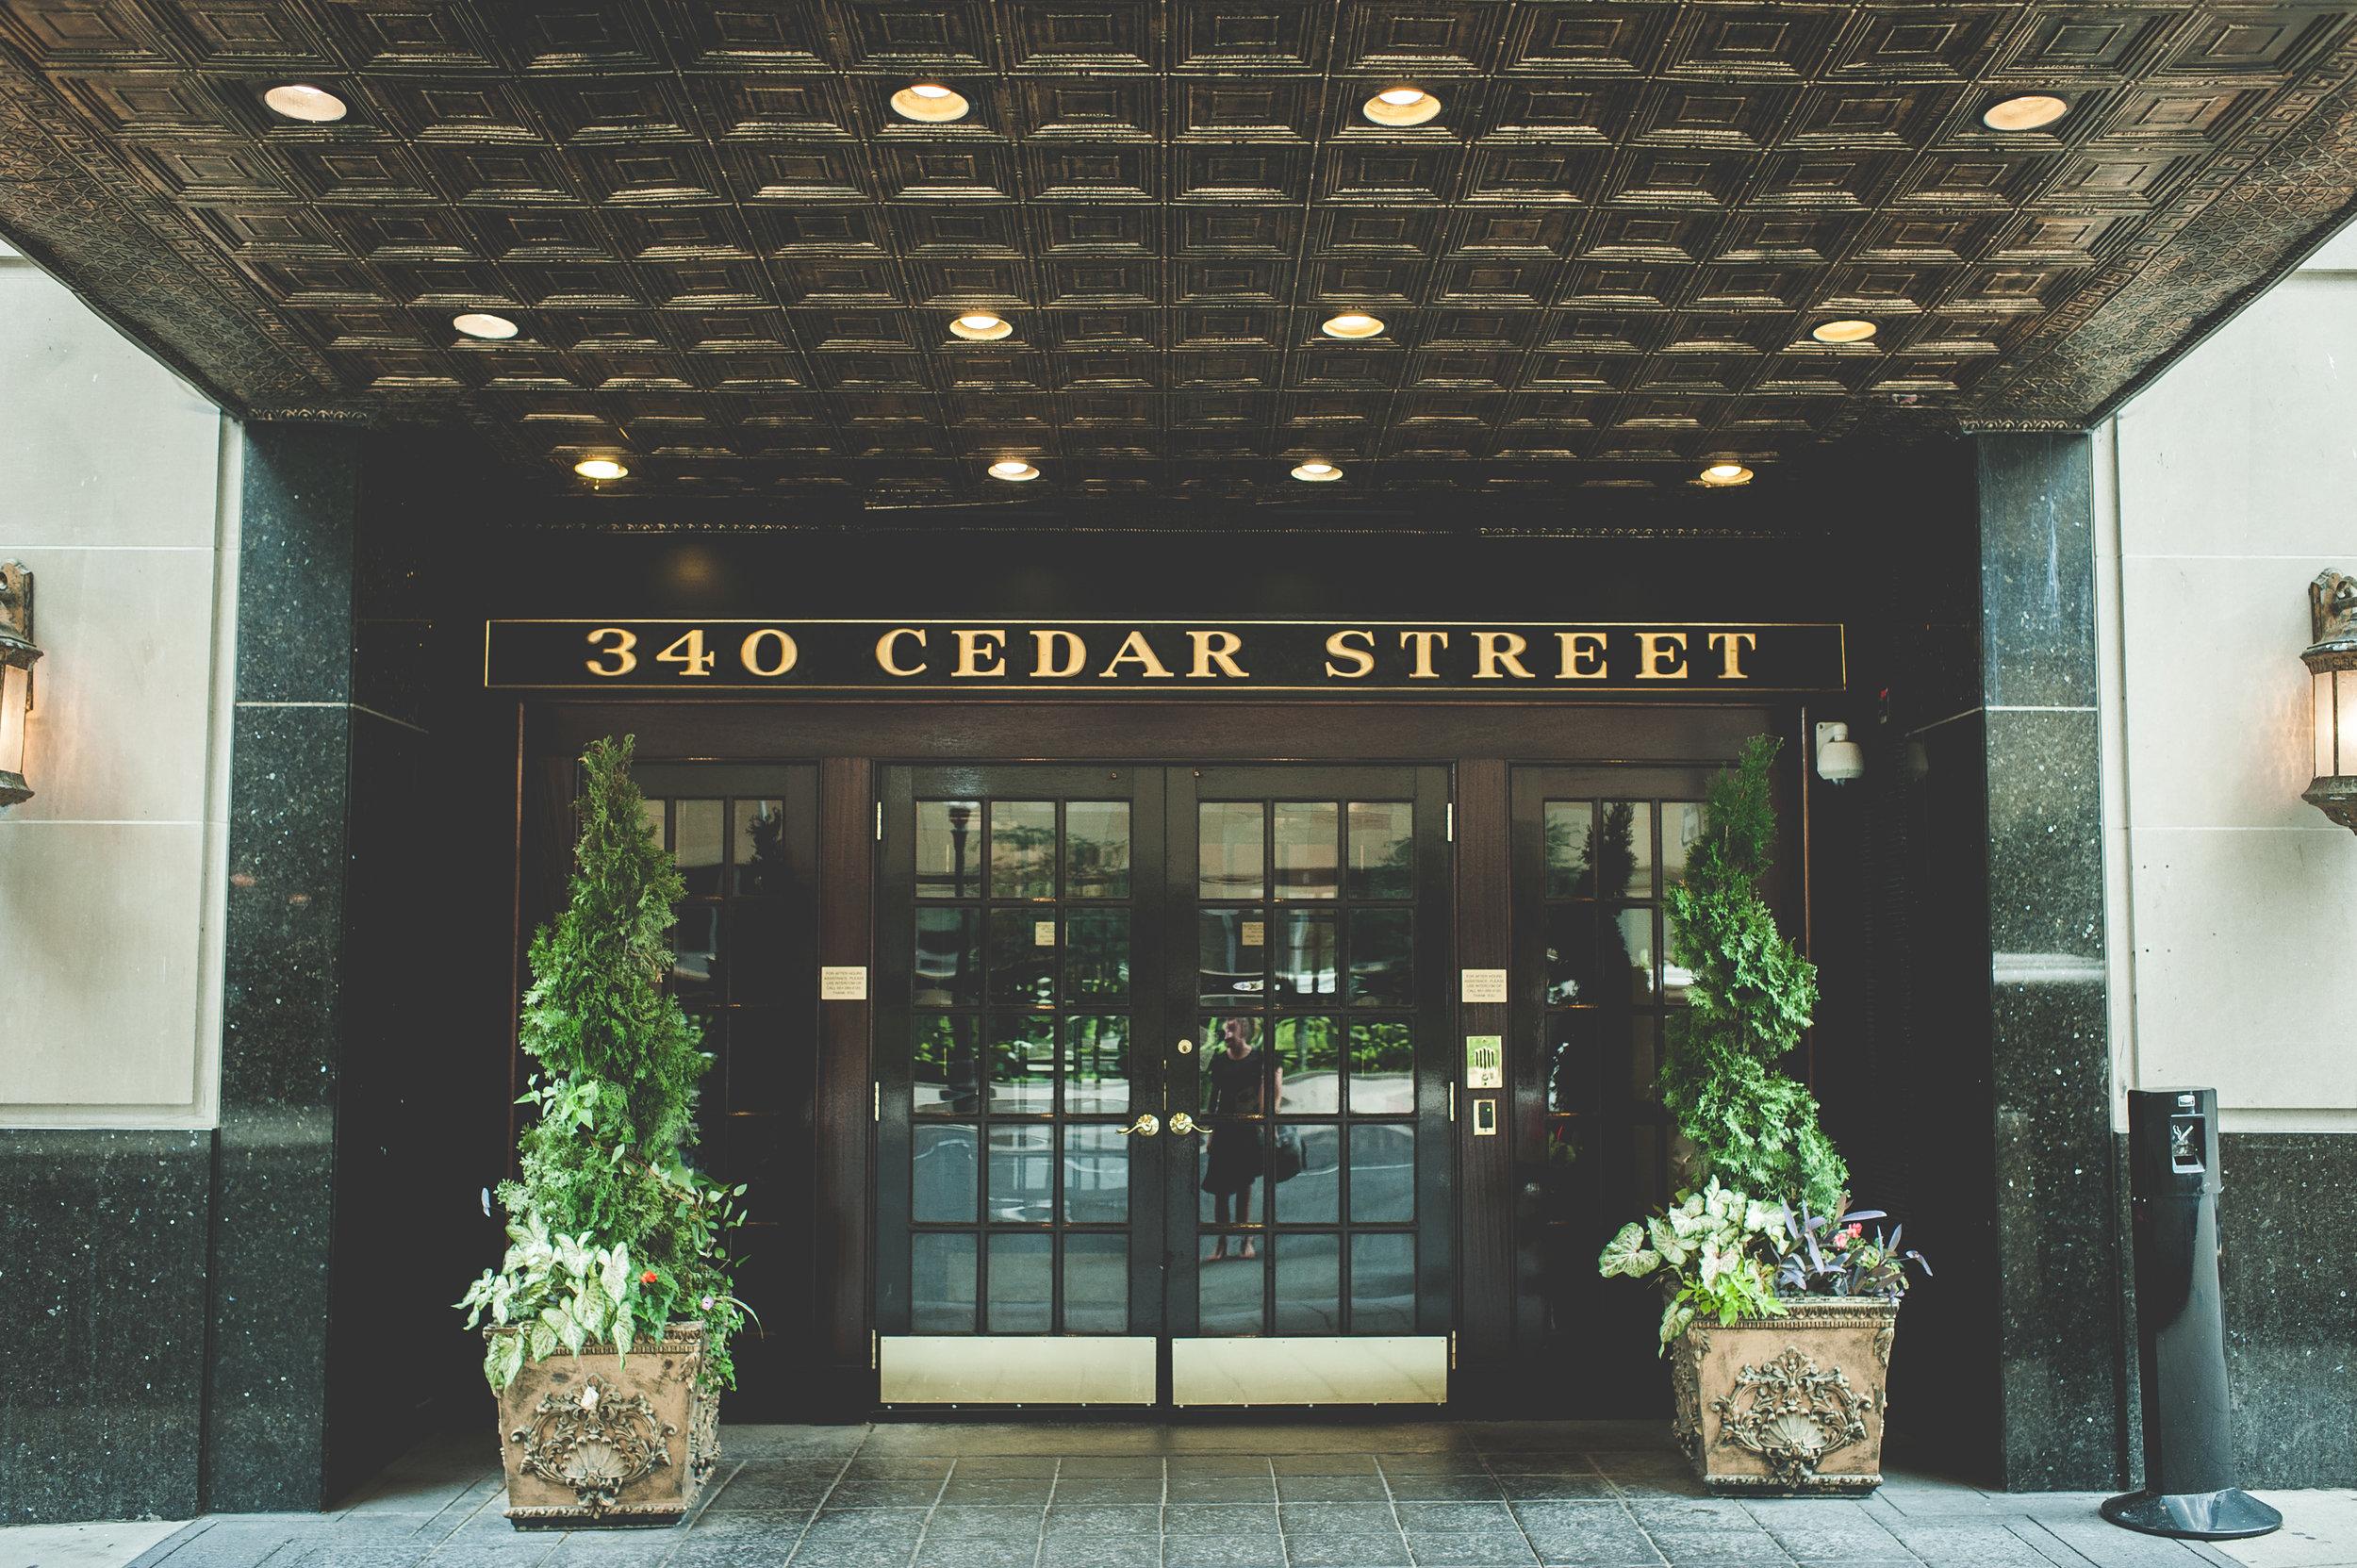 340 Cedar Street View